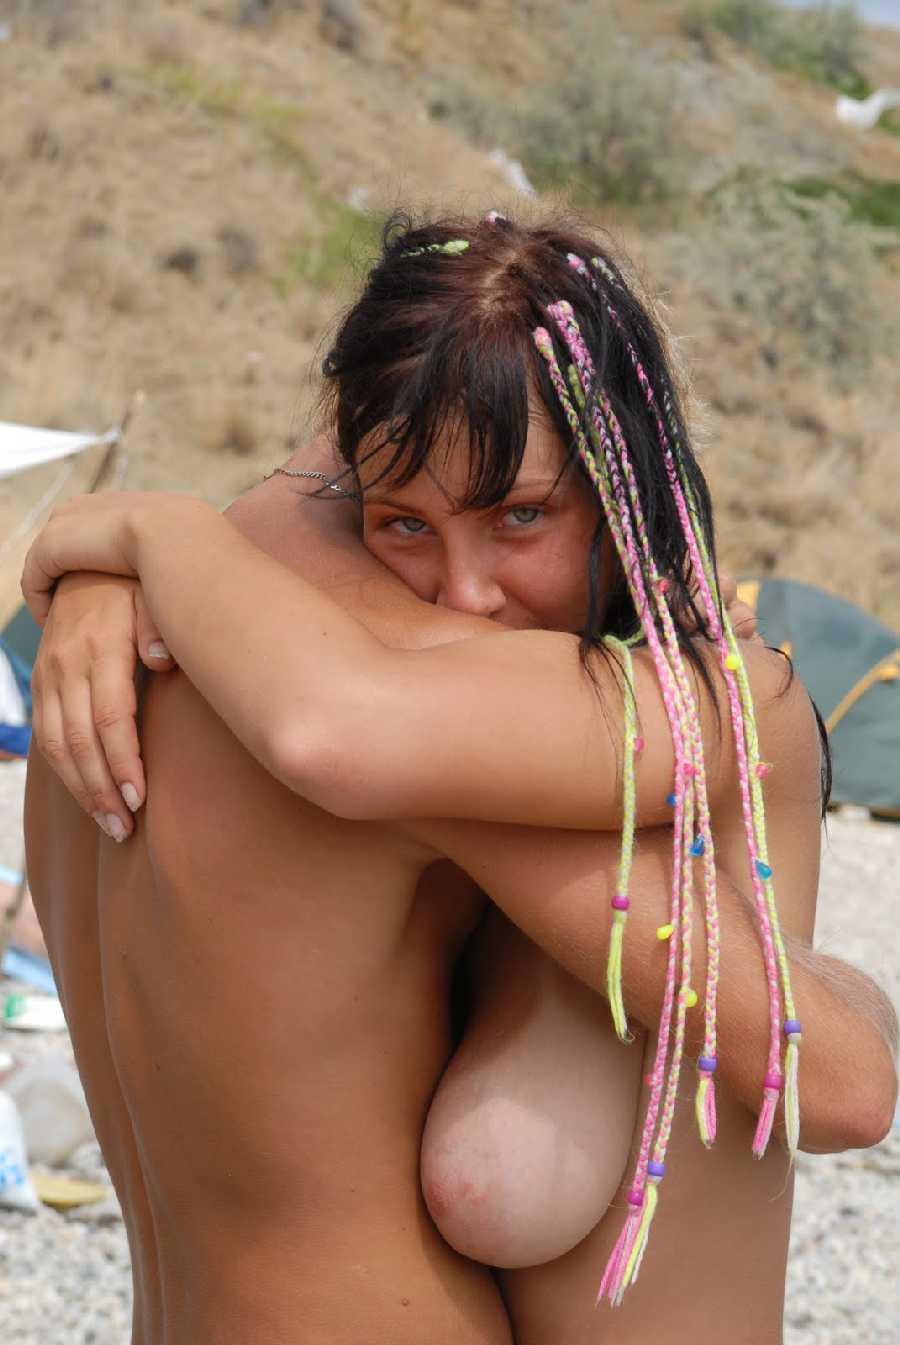 Nude hippie girl big boobs images